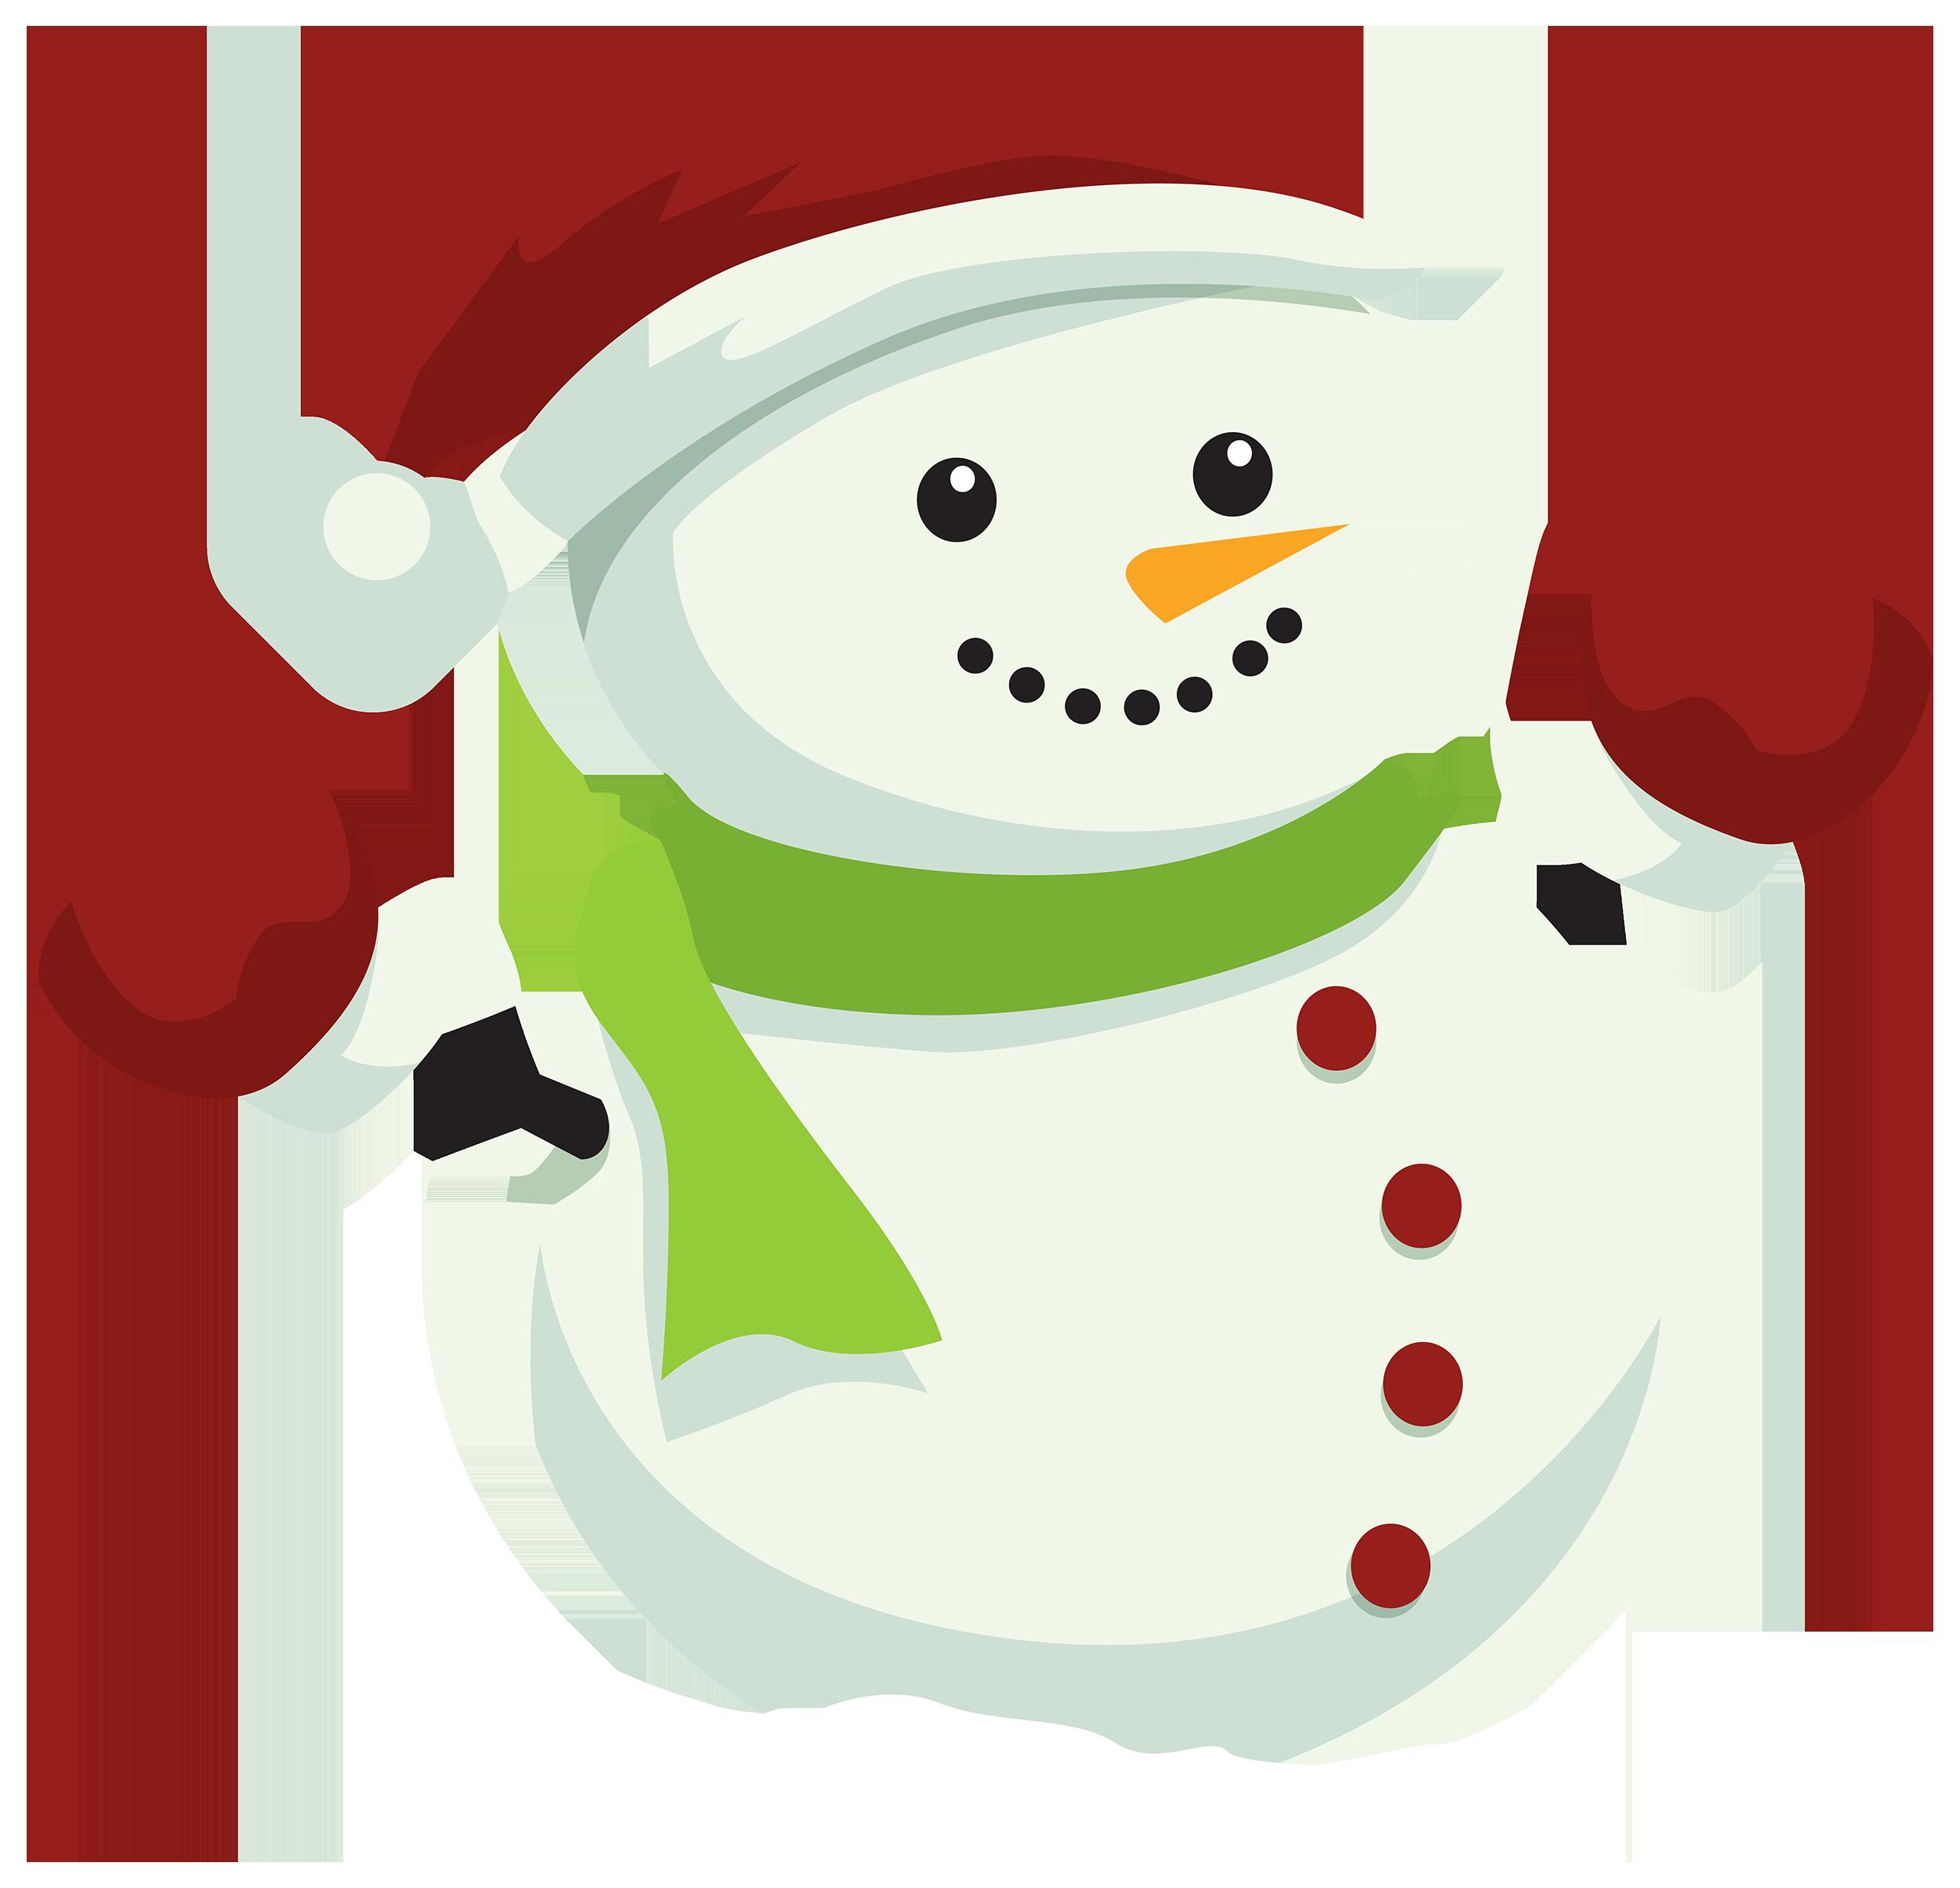 2500x2408 Image Result For Snowman Snowman Snowman